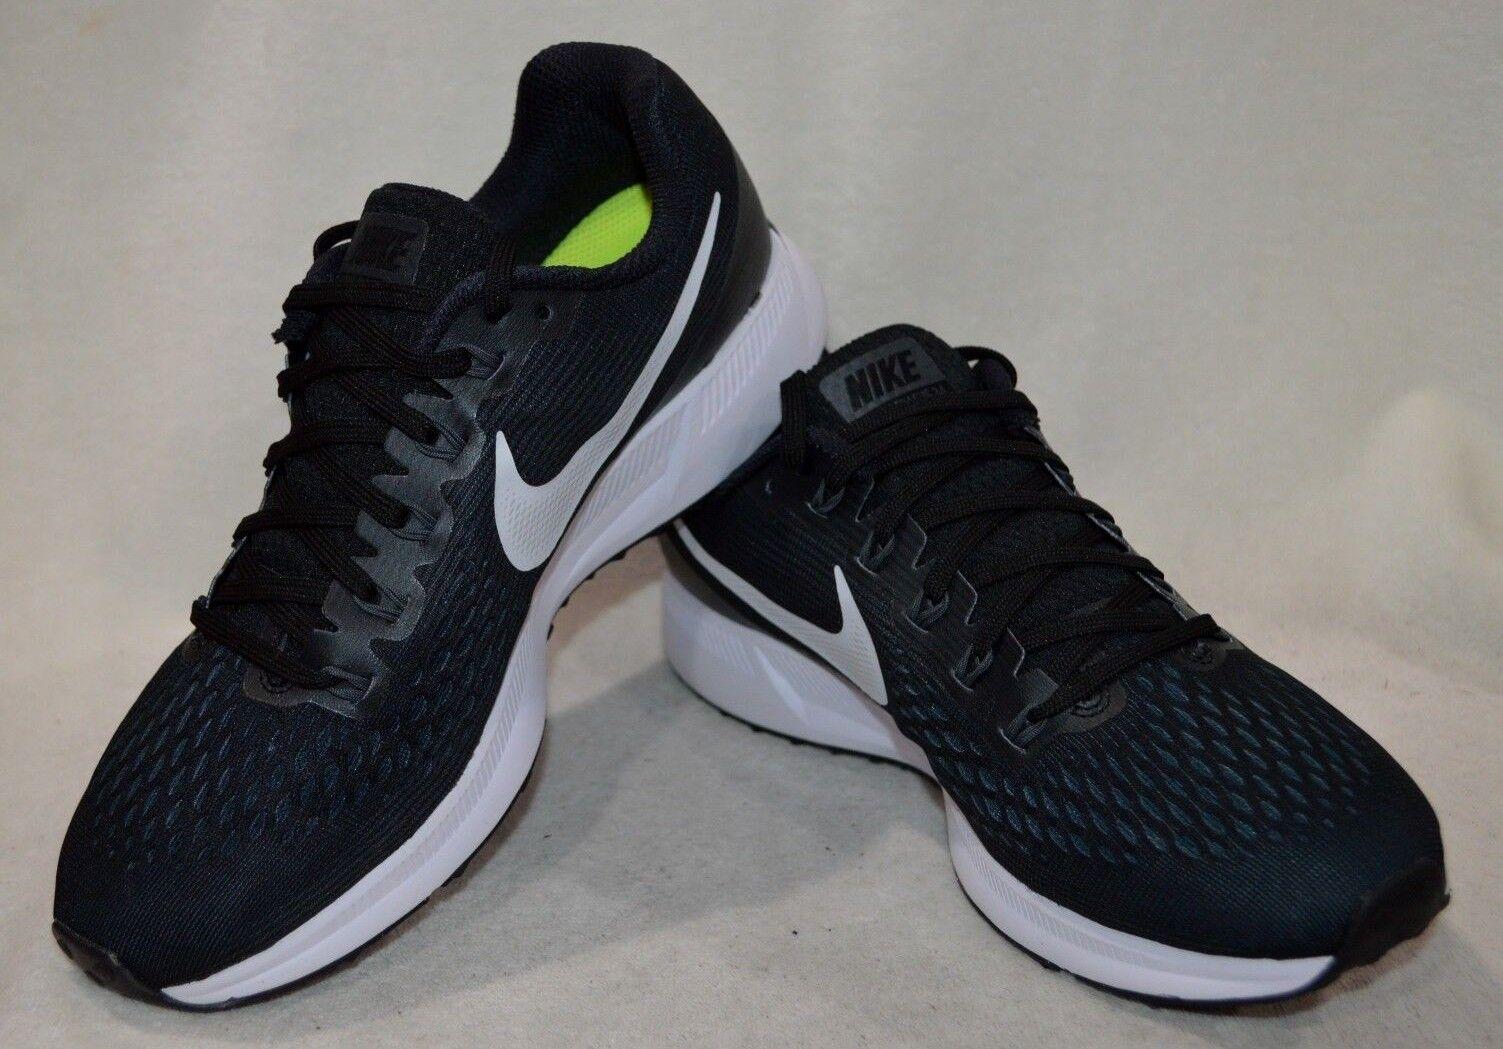 Nike Air Zoom Pegasus 34 nero bianca grigio Wouomo Running scarpe-Asst Dimensiones WIDE